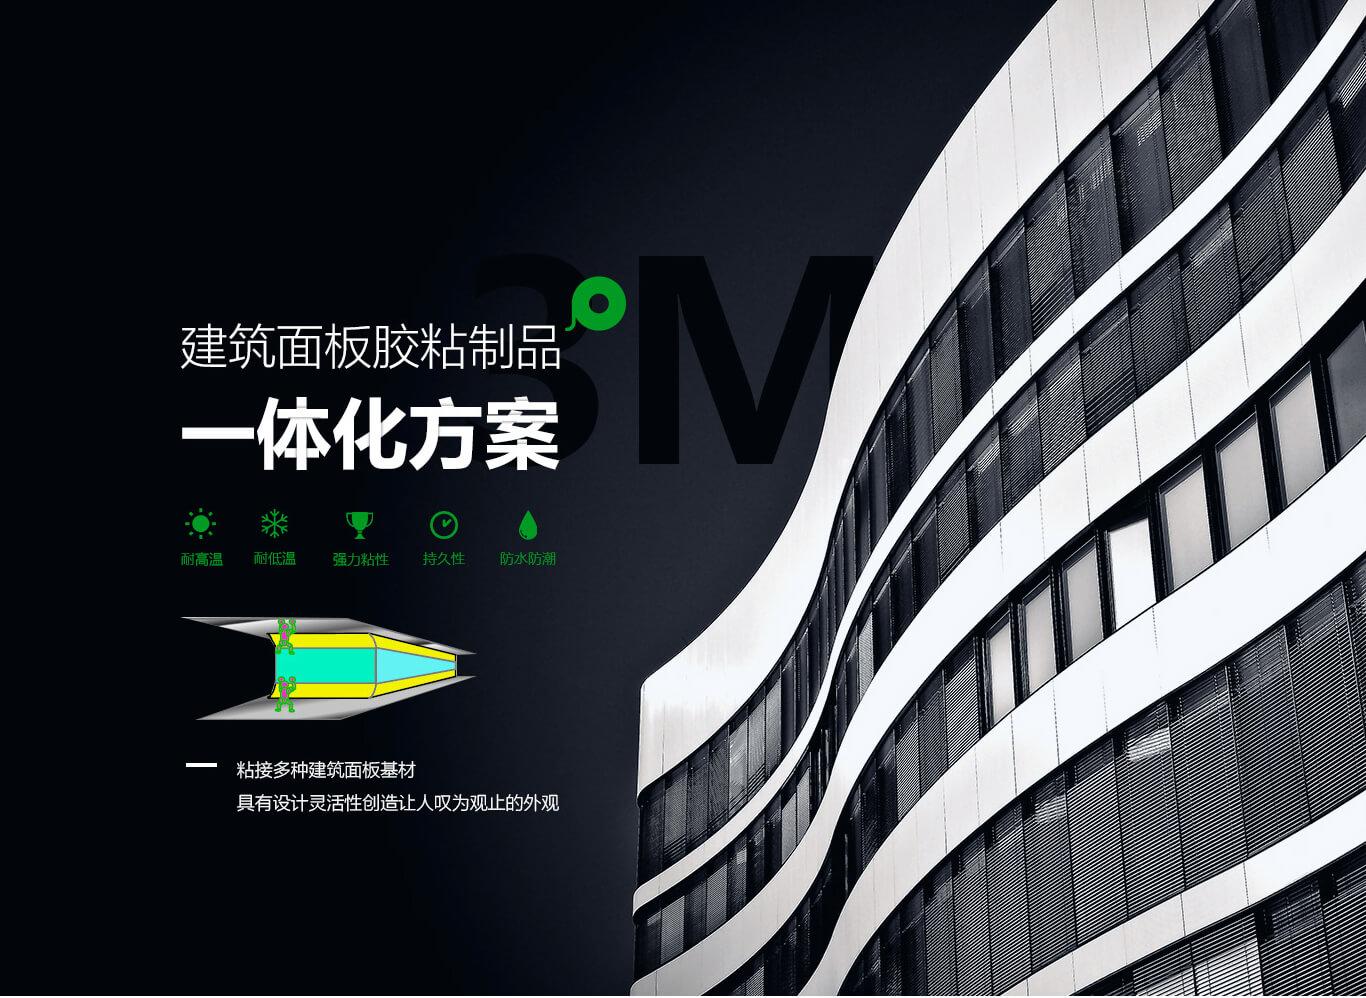 3M双面胶_3M胶带_3M深圳经销商-深圳百川工业胶带